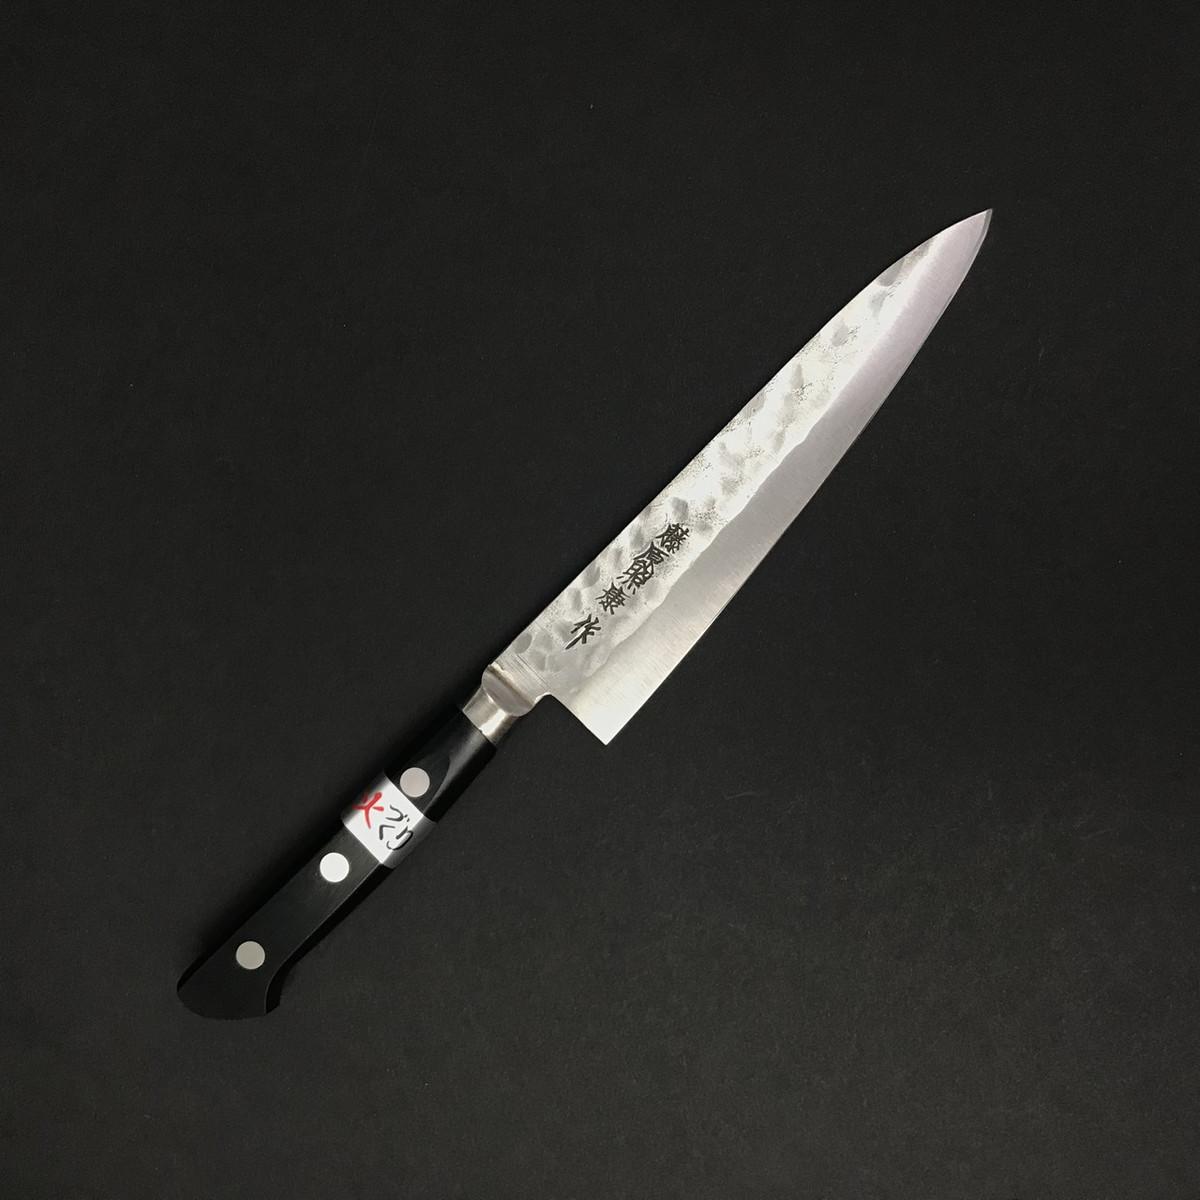 Fujiwara | Maboroshi | Petty 150mm